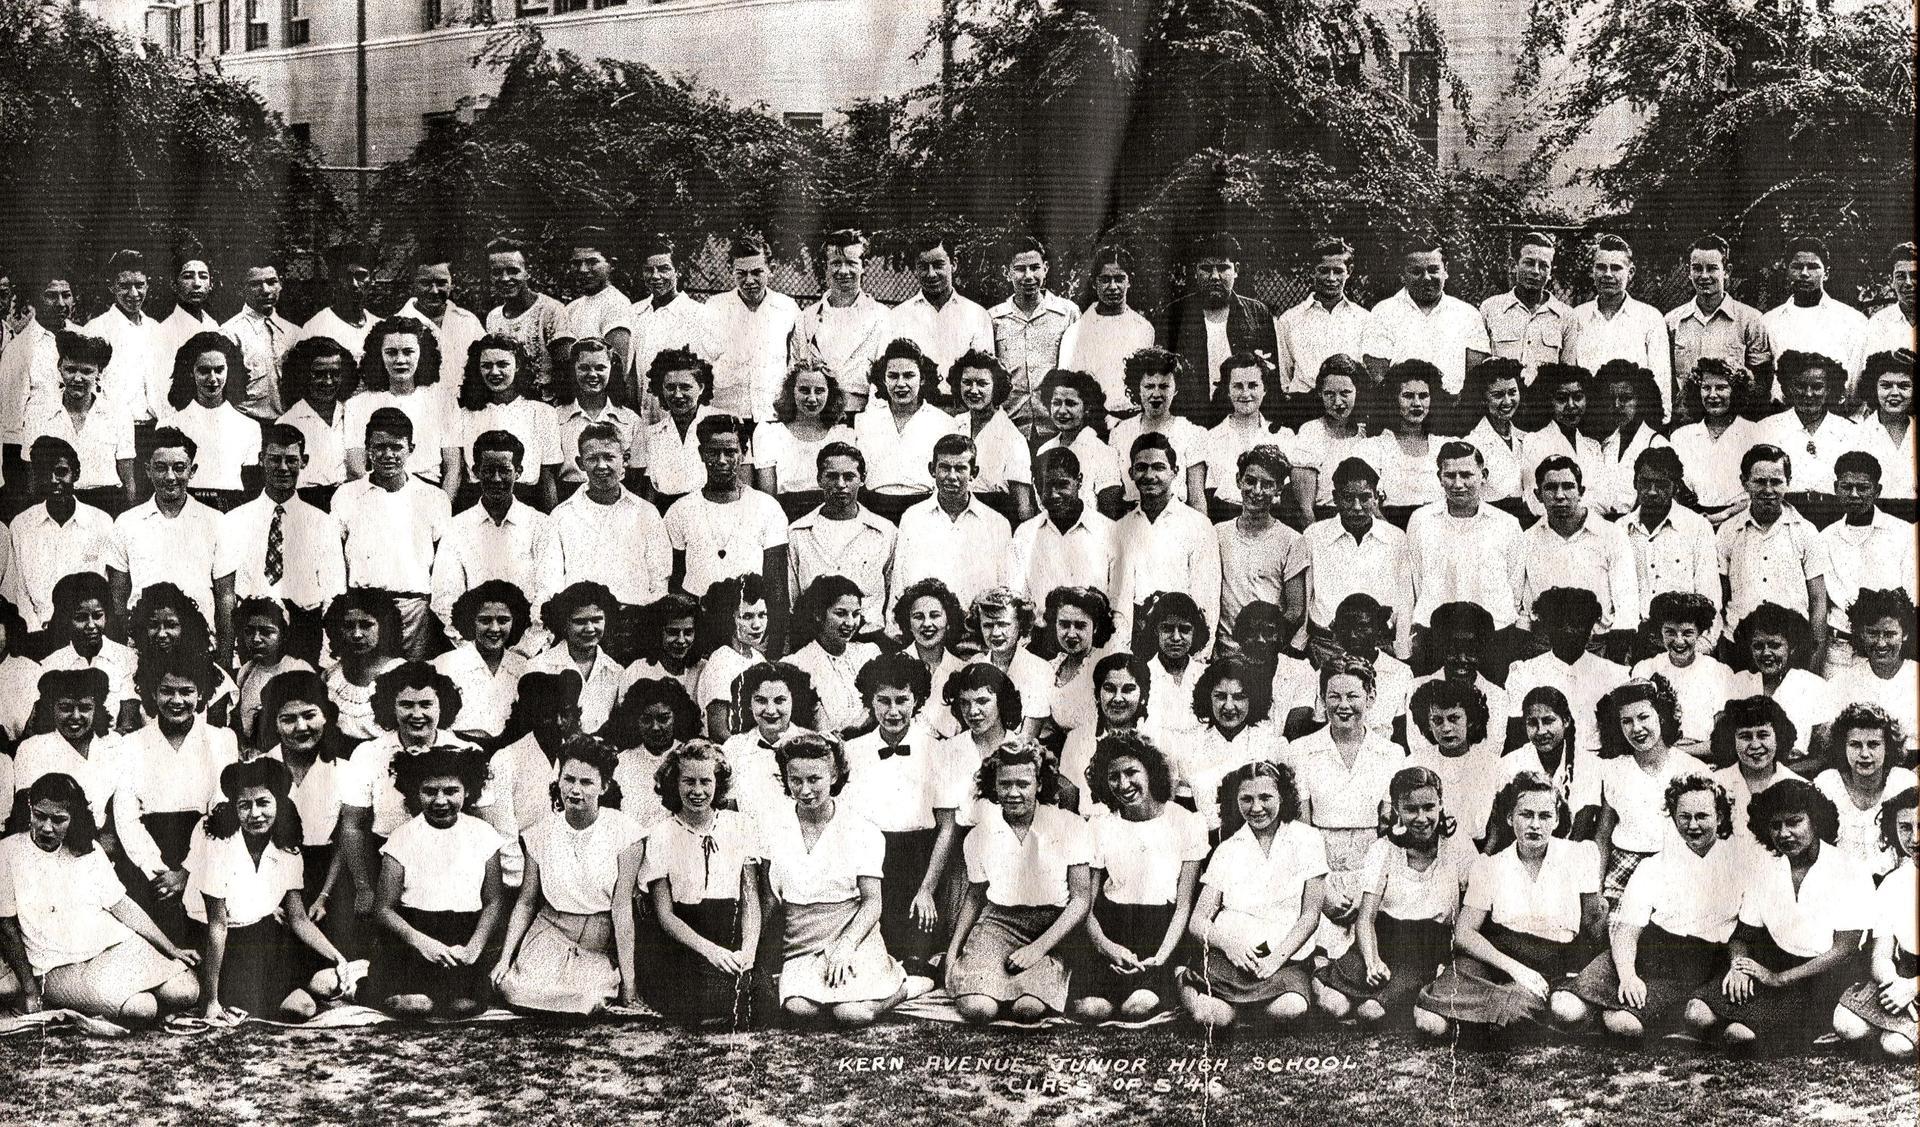 Kern Avenue Junior High 1940s